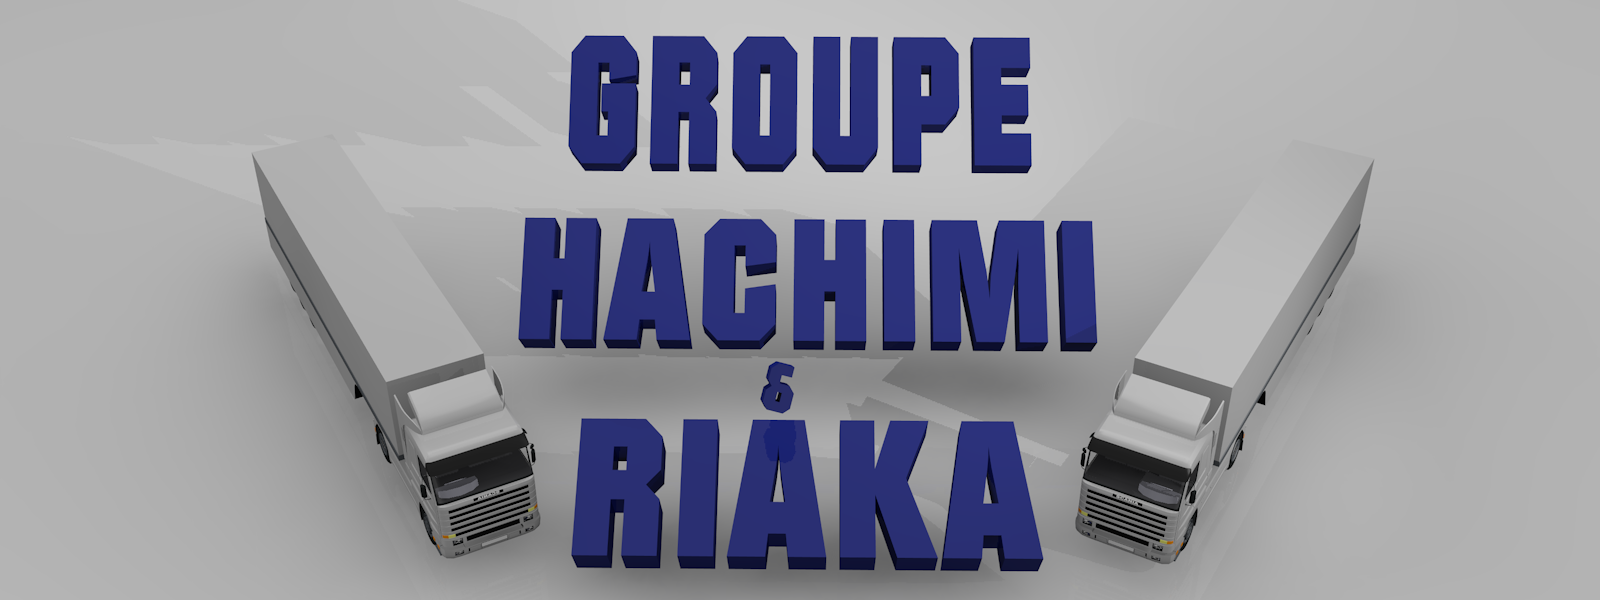 groupehachimi_BG11